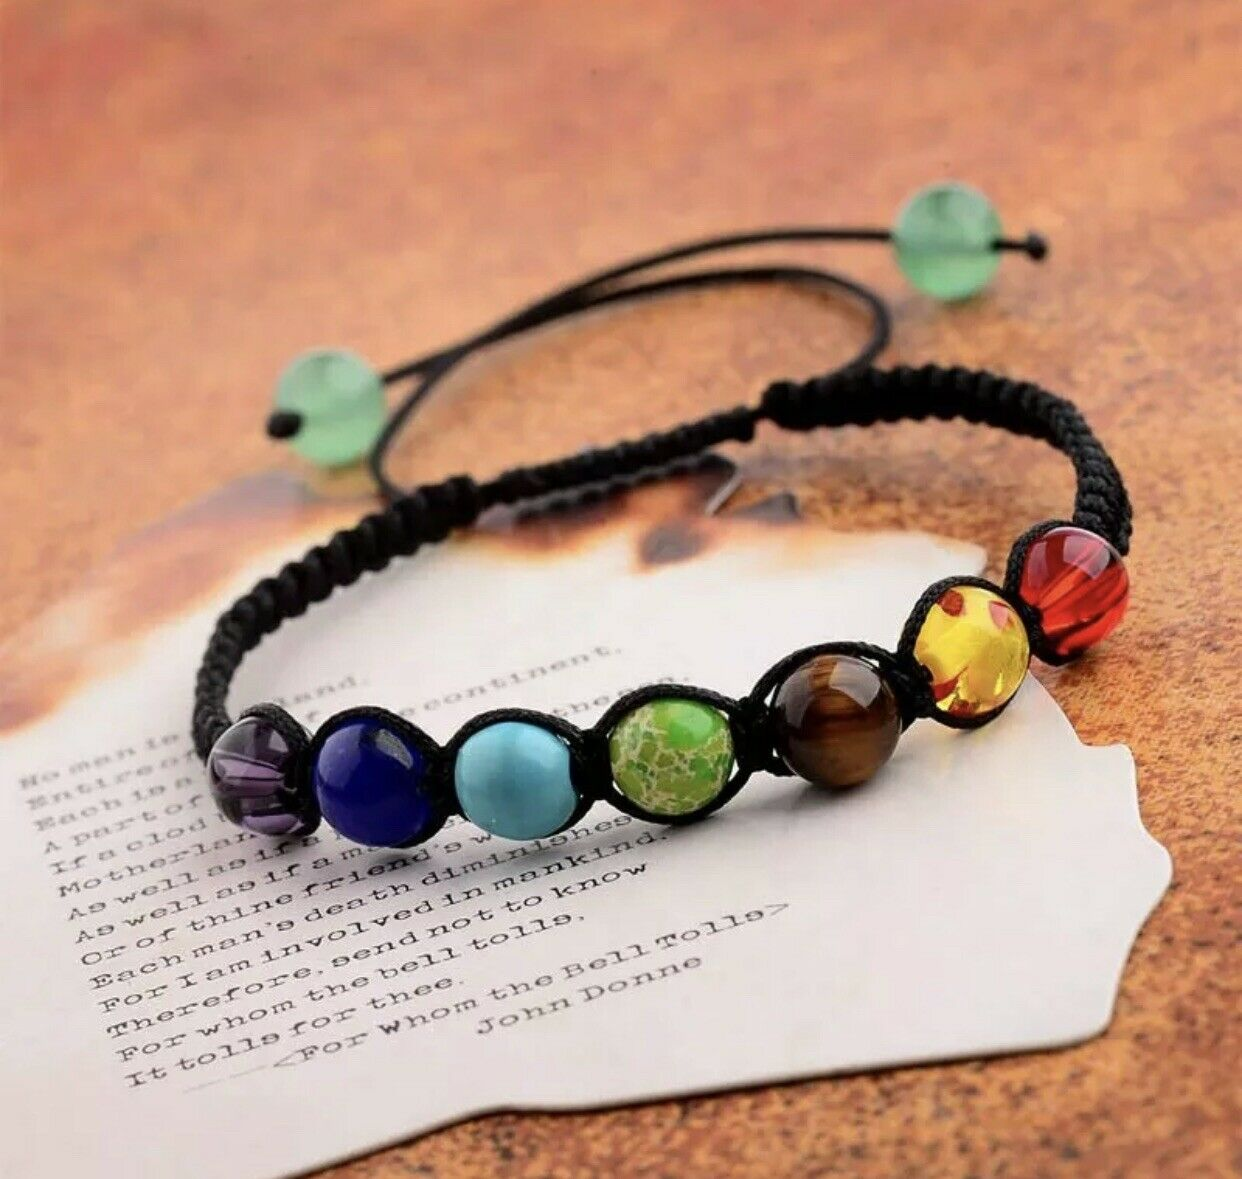 Meditation Gift Minimalist Crystal Bracelet Amulet. Adjustable Thin Cord String Bracelet 7 Chakra Bracelet Yoga Gift